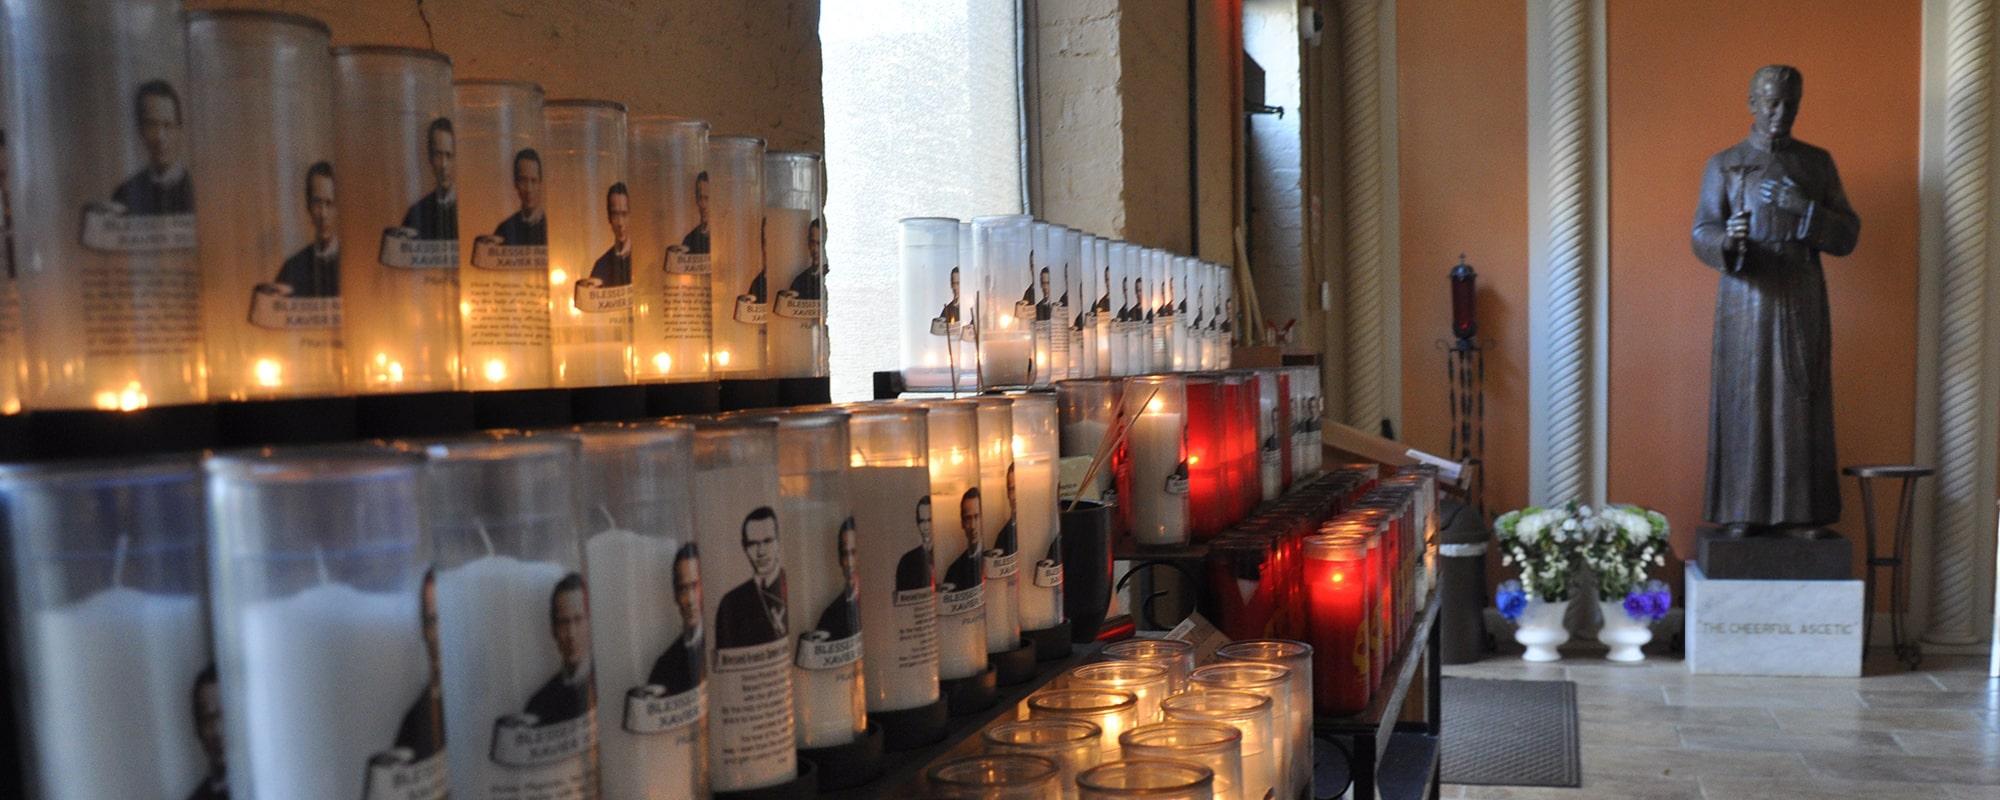 Seelos Shrine votive candles